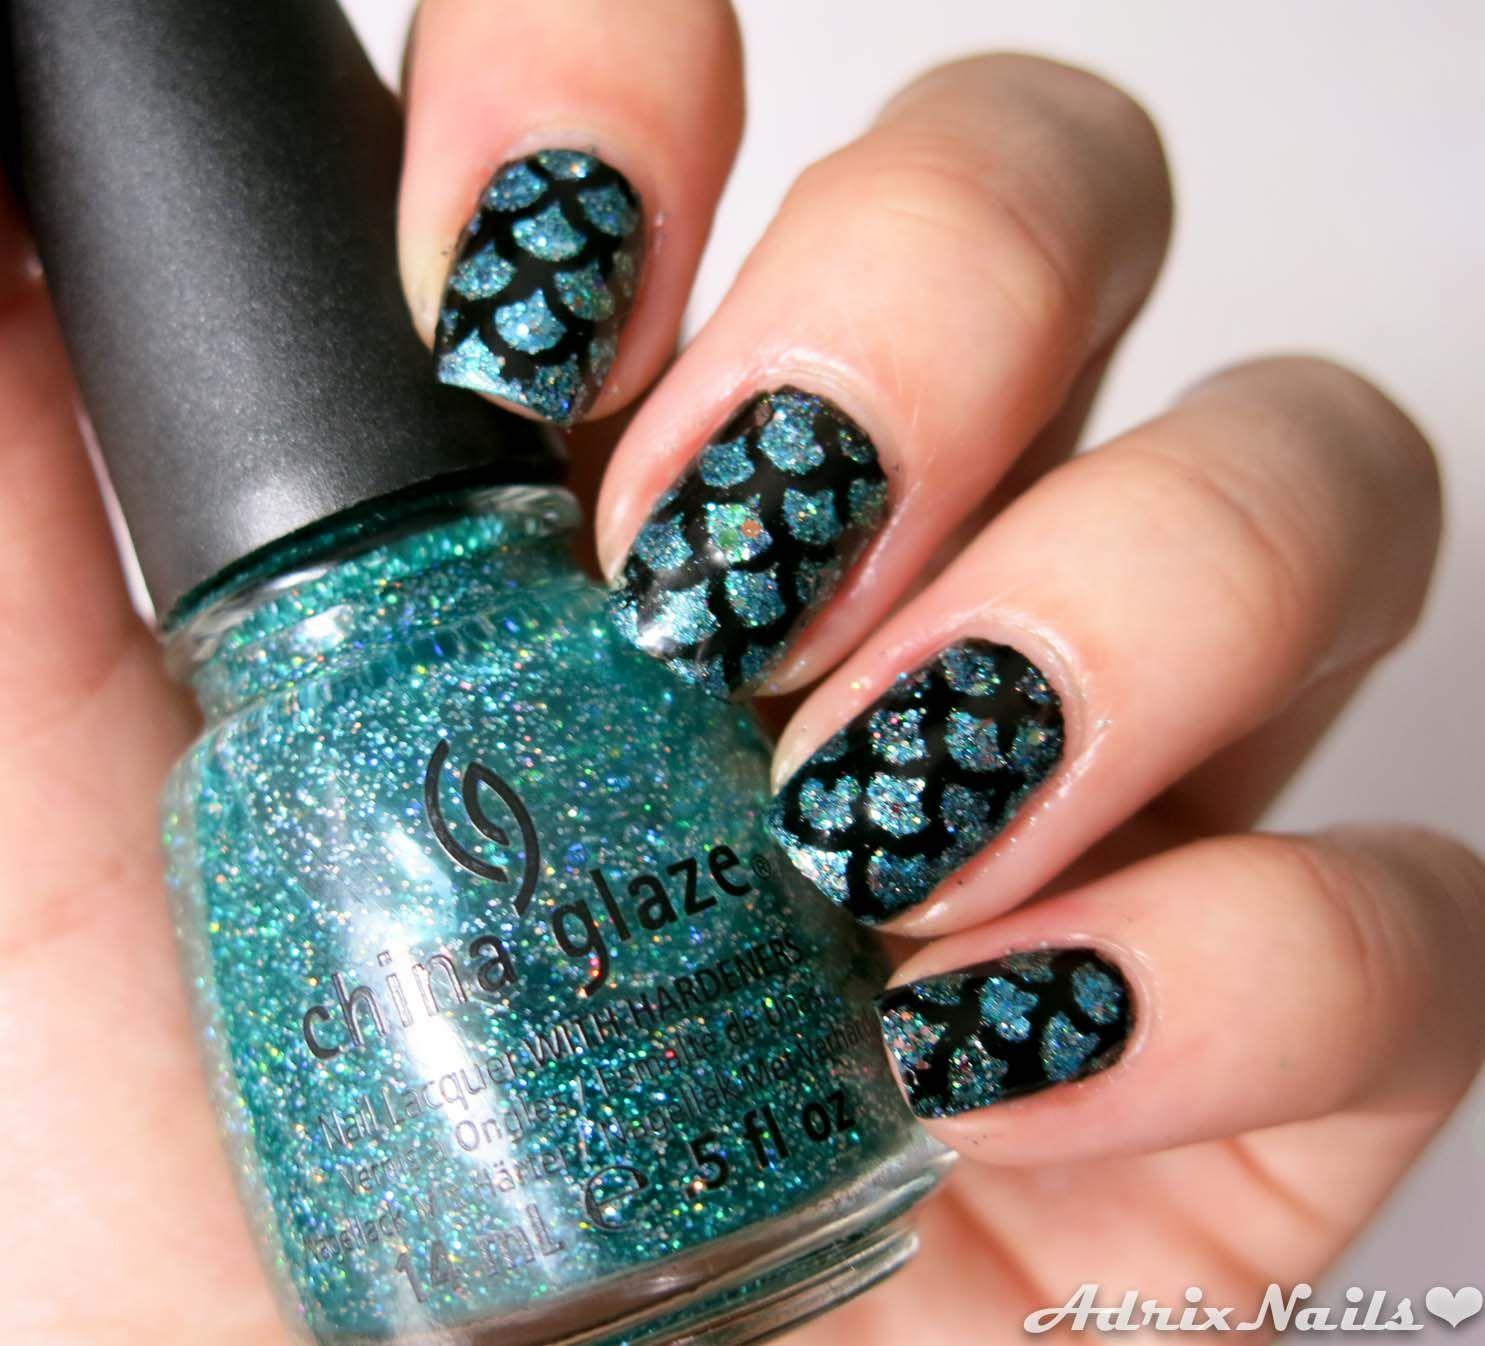 Tutorial - Uñas de sirena usando viniles- #nails #nailart ...